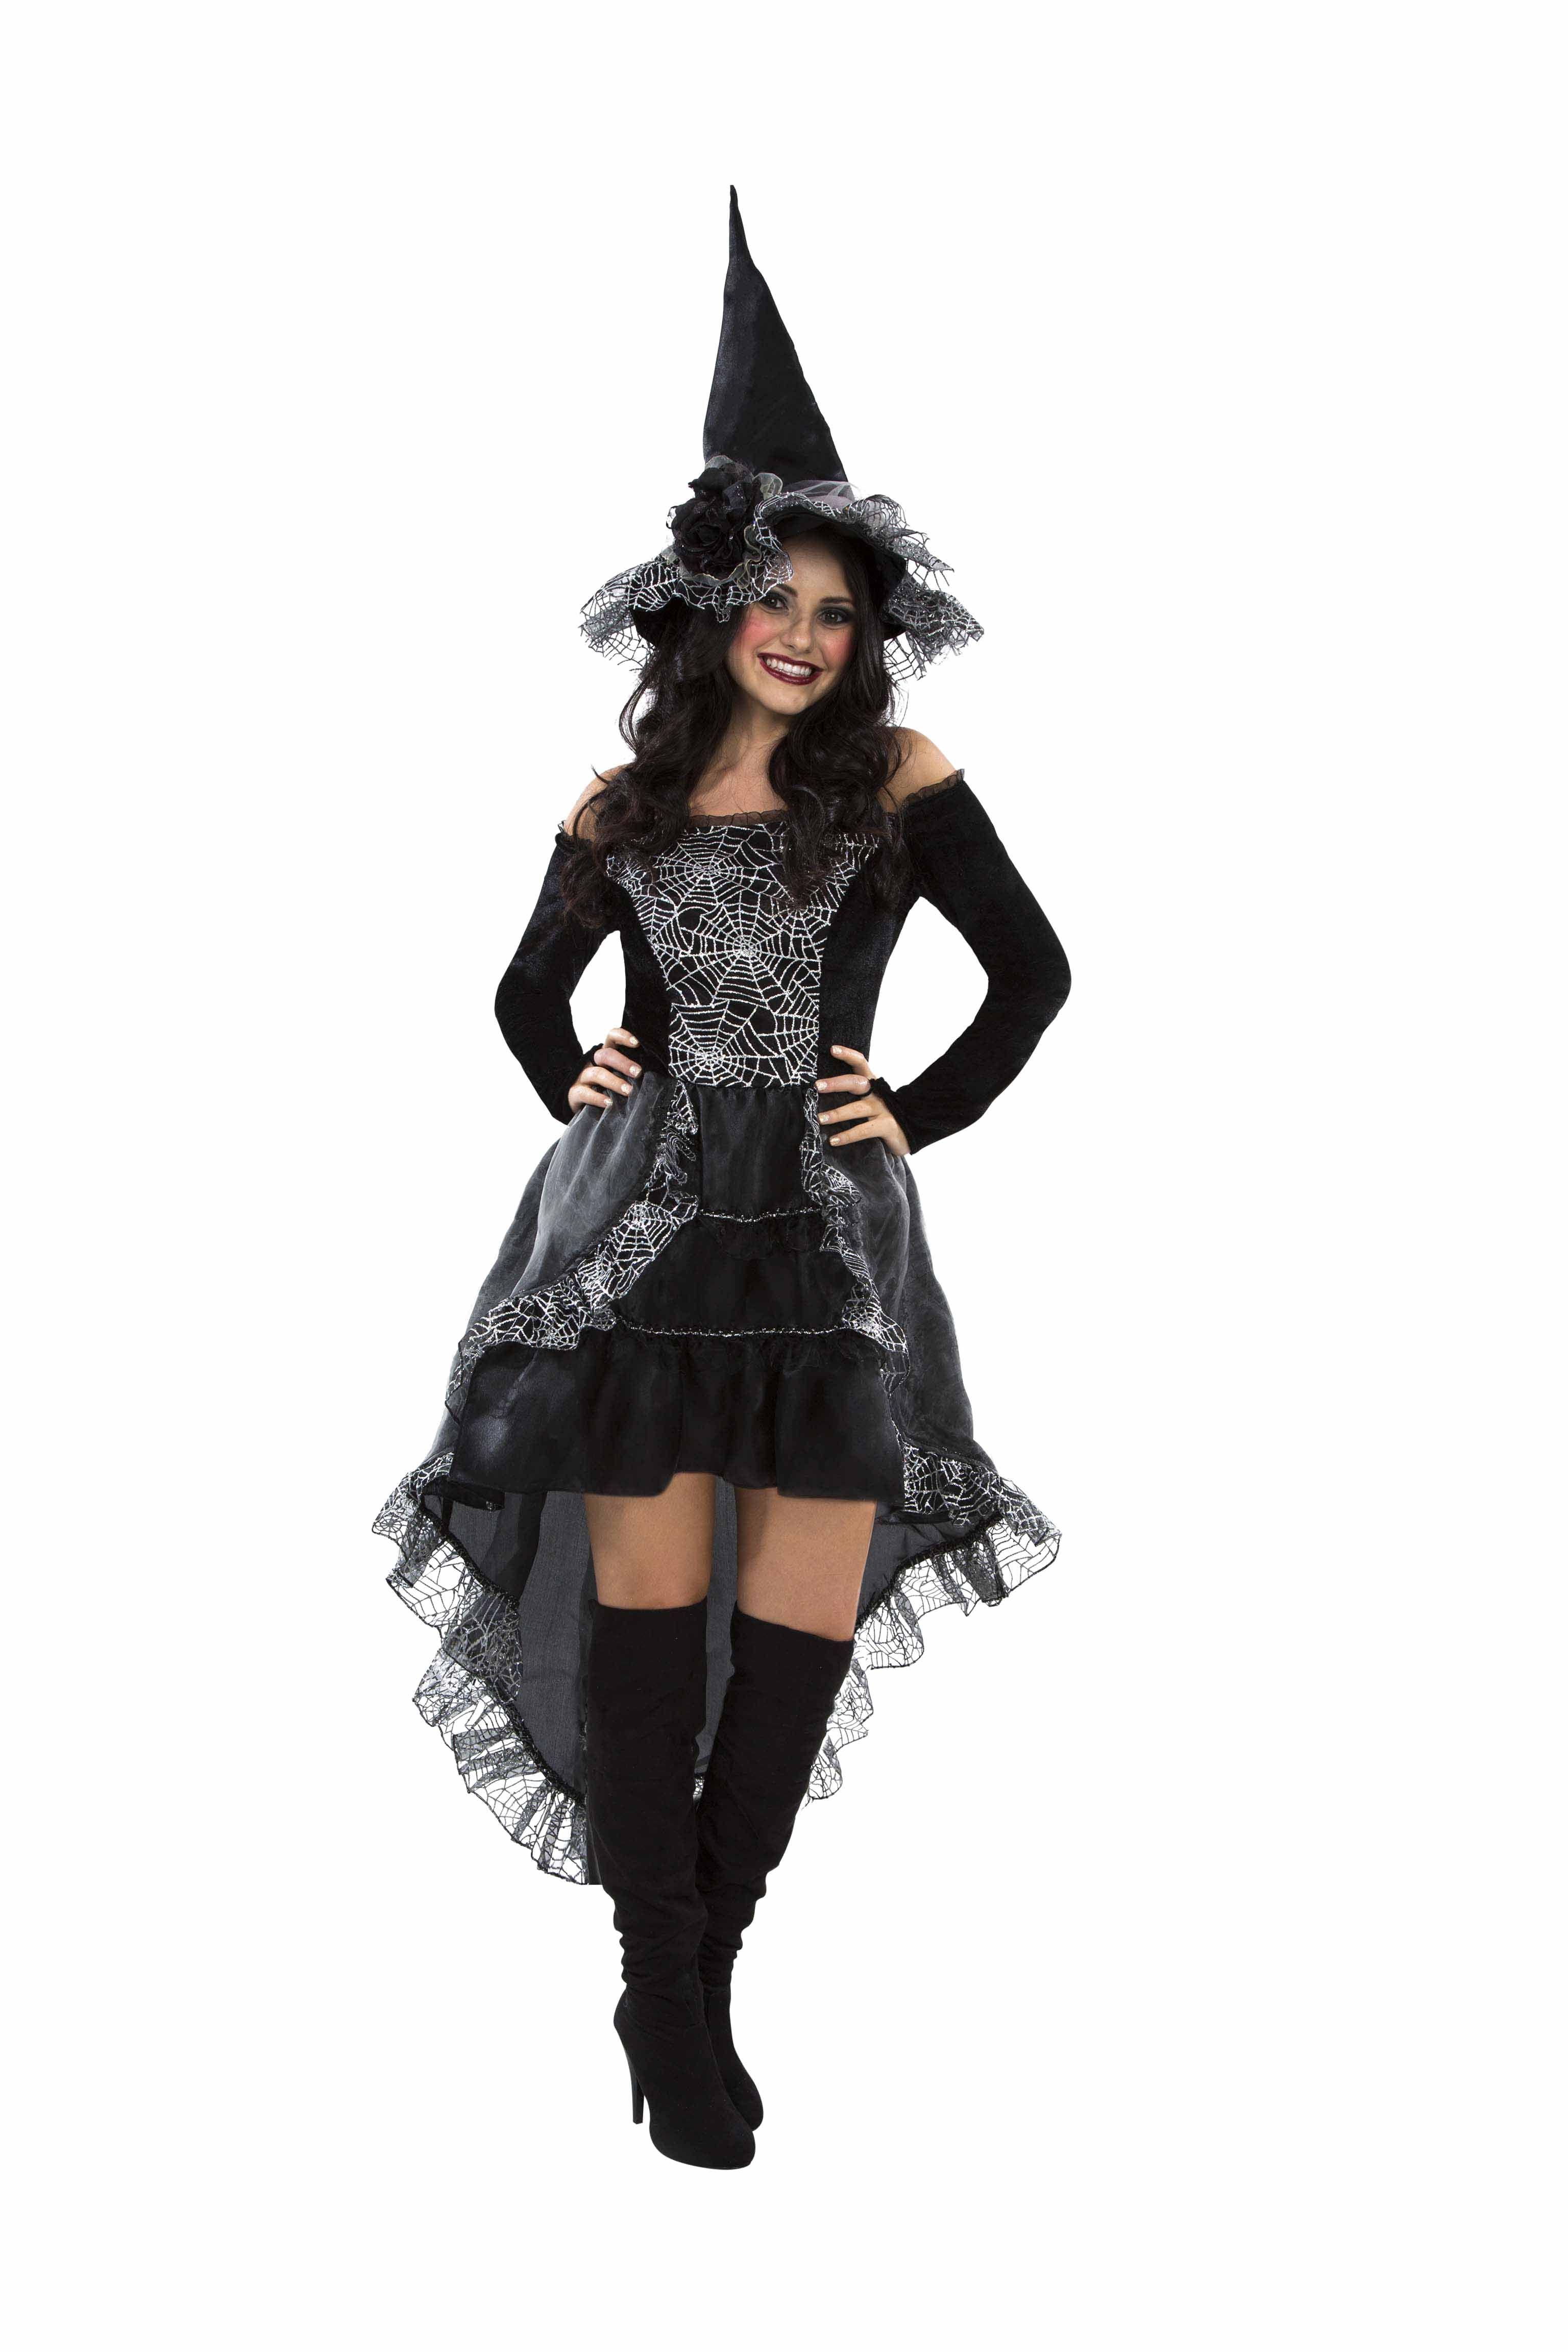 spider web witch costume meijer halloween 2014 - Spider Witch Halloween Costume